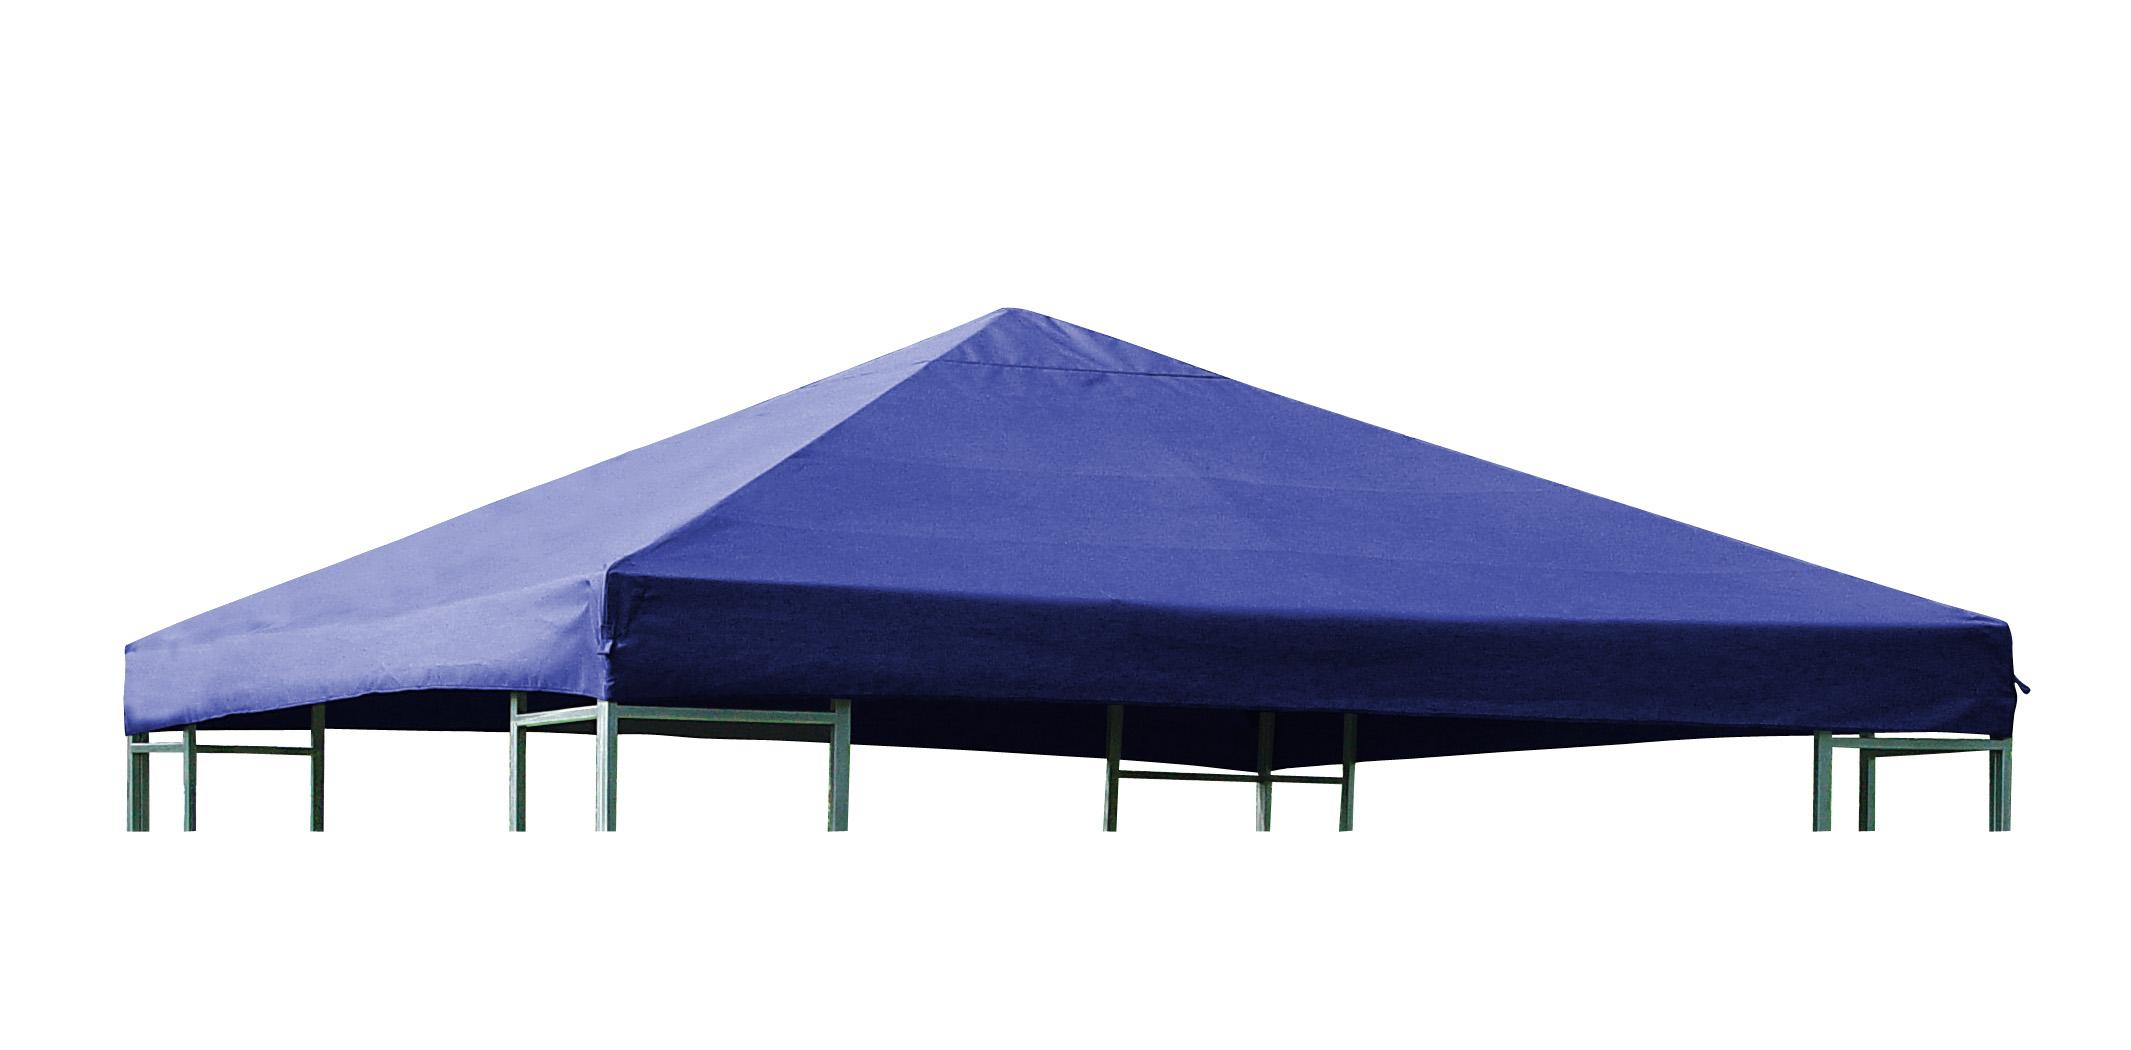 ersatzdach pavillonplane ersatzplane pavillon pavillondach 3x3m wasserdicht blau ebay. Black Bedroom Furniture Sets. Home Design Ideas